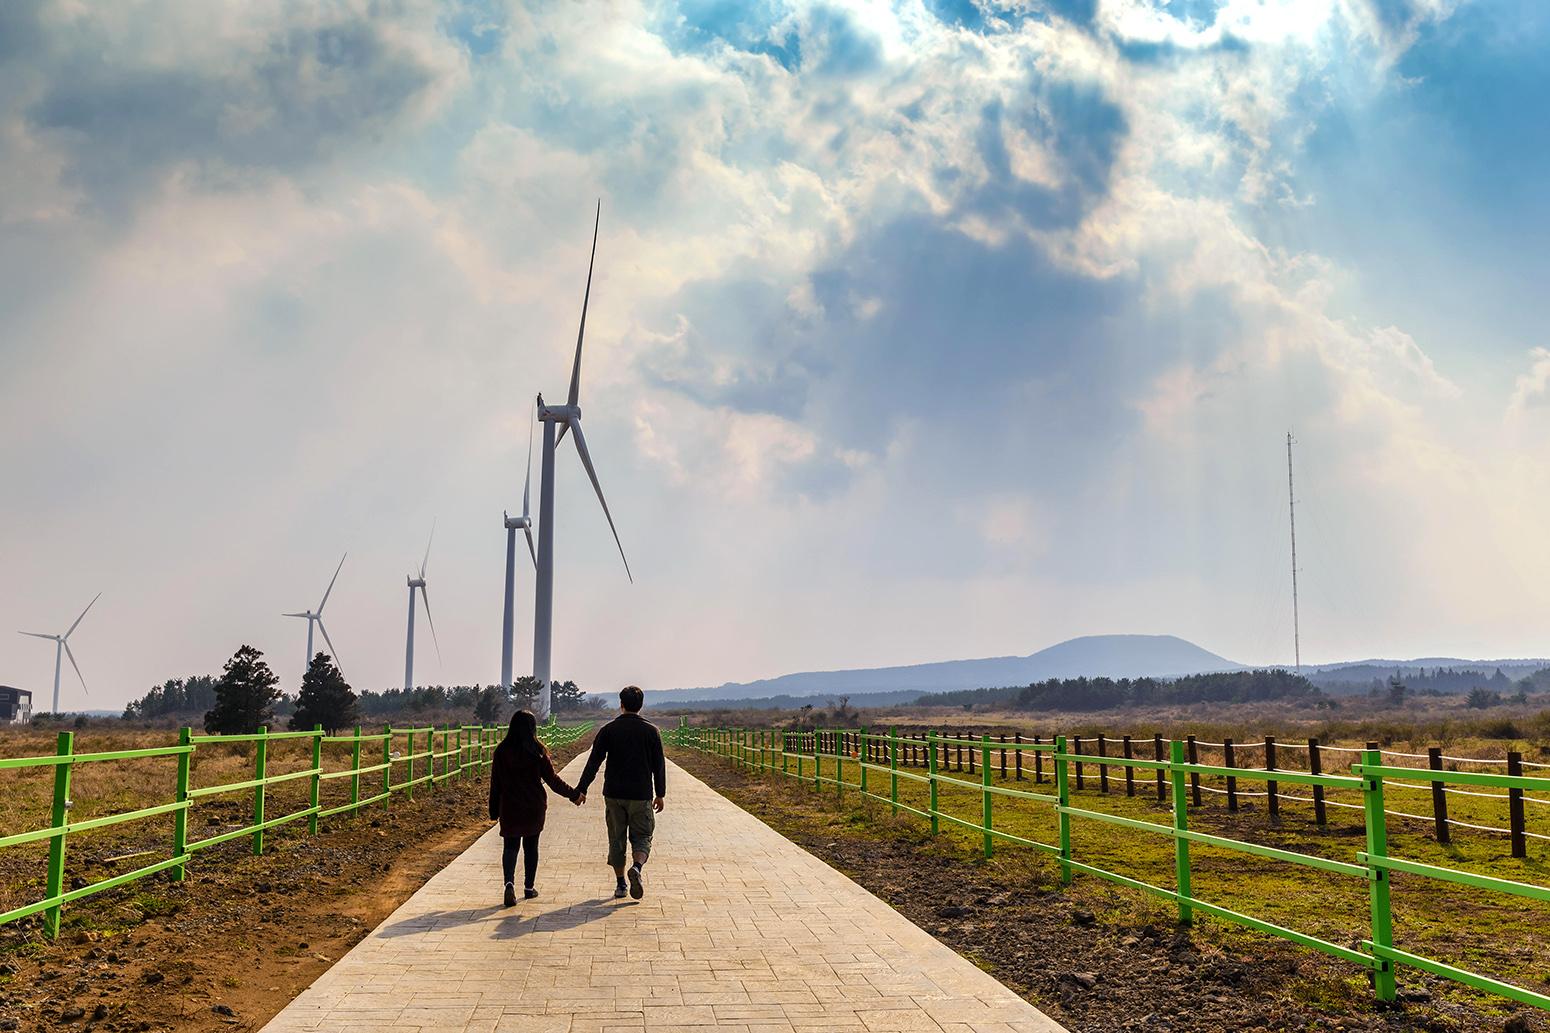 A wind farm on Jeju Island, South Korea. Credit: Noppasin Wongchum / Alamy Stock Photo. HX0BP5